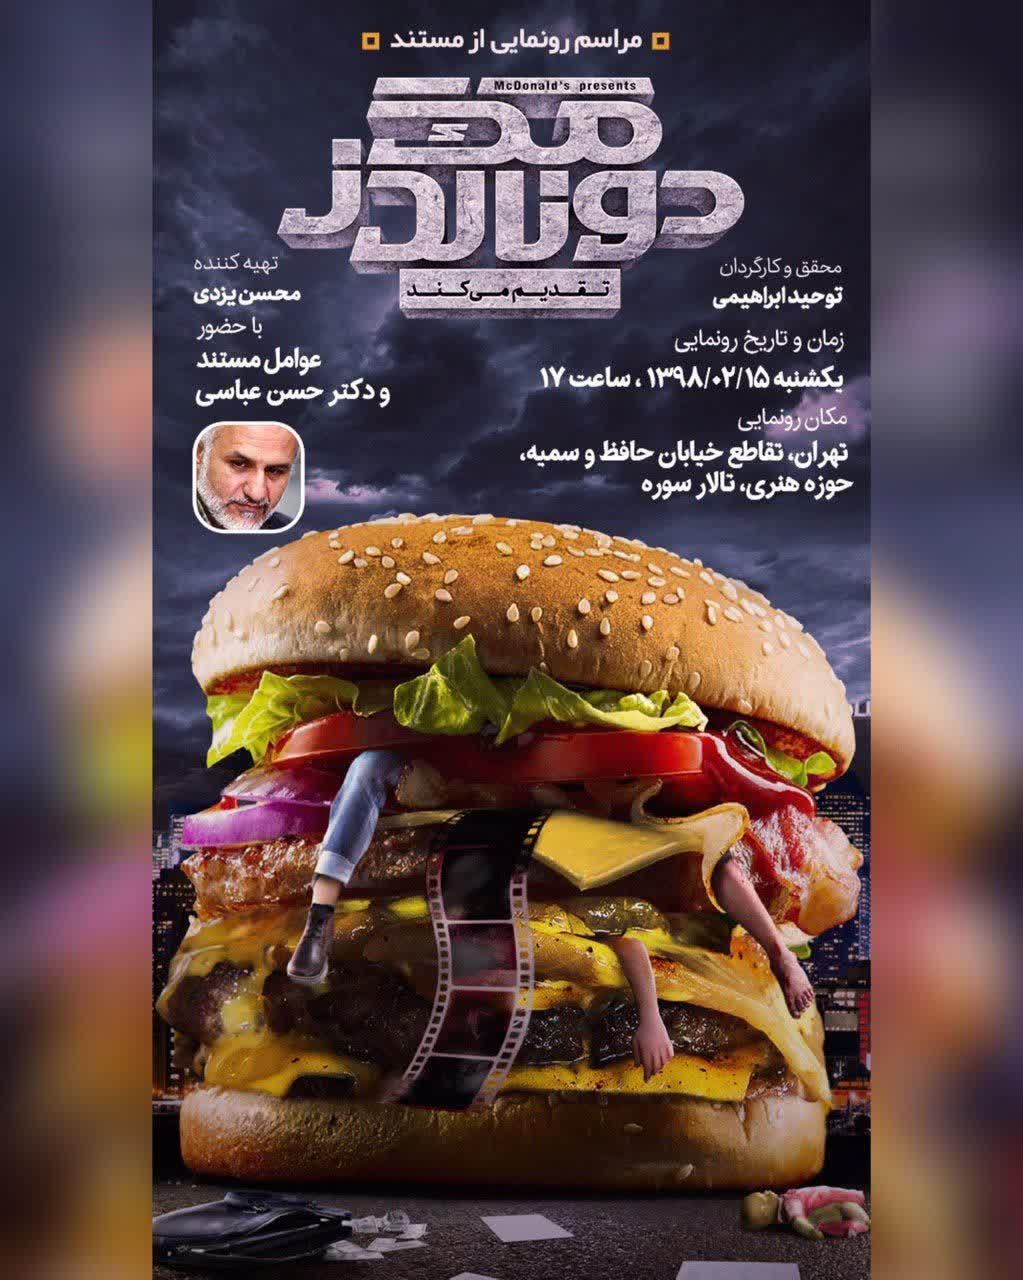 photo 2019 05 13 15 28 23 ۱۵ اردیبهشت ۹۸؛ سخنرانی استاد حسن عباسی در حوزه هنری